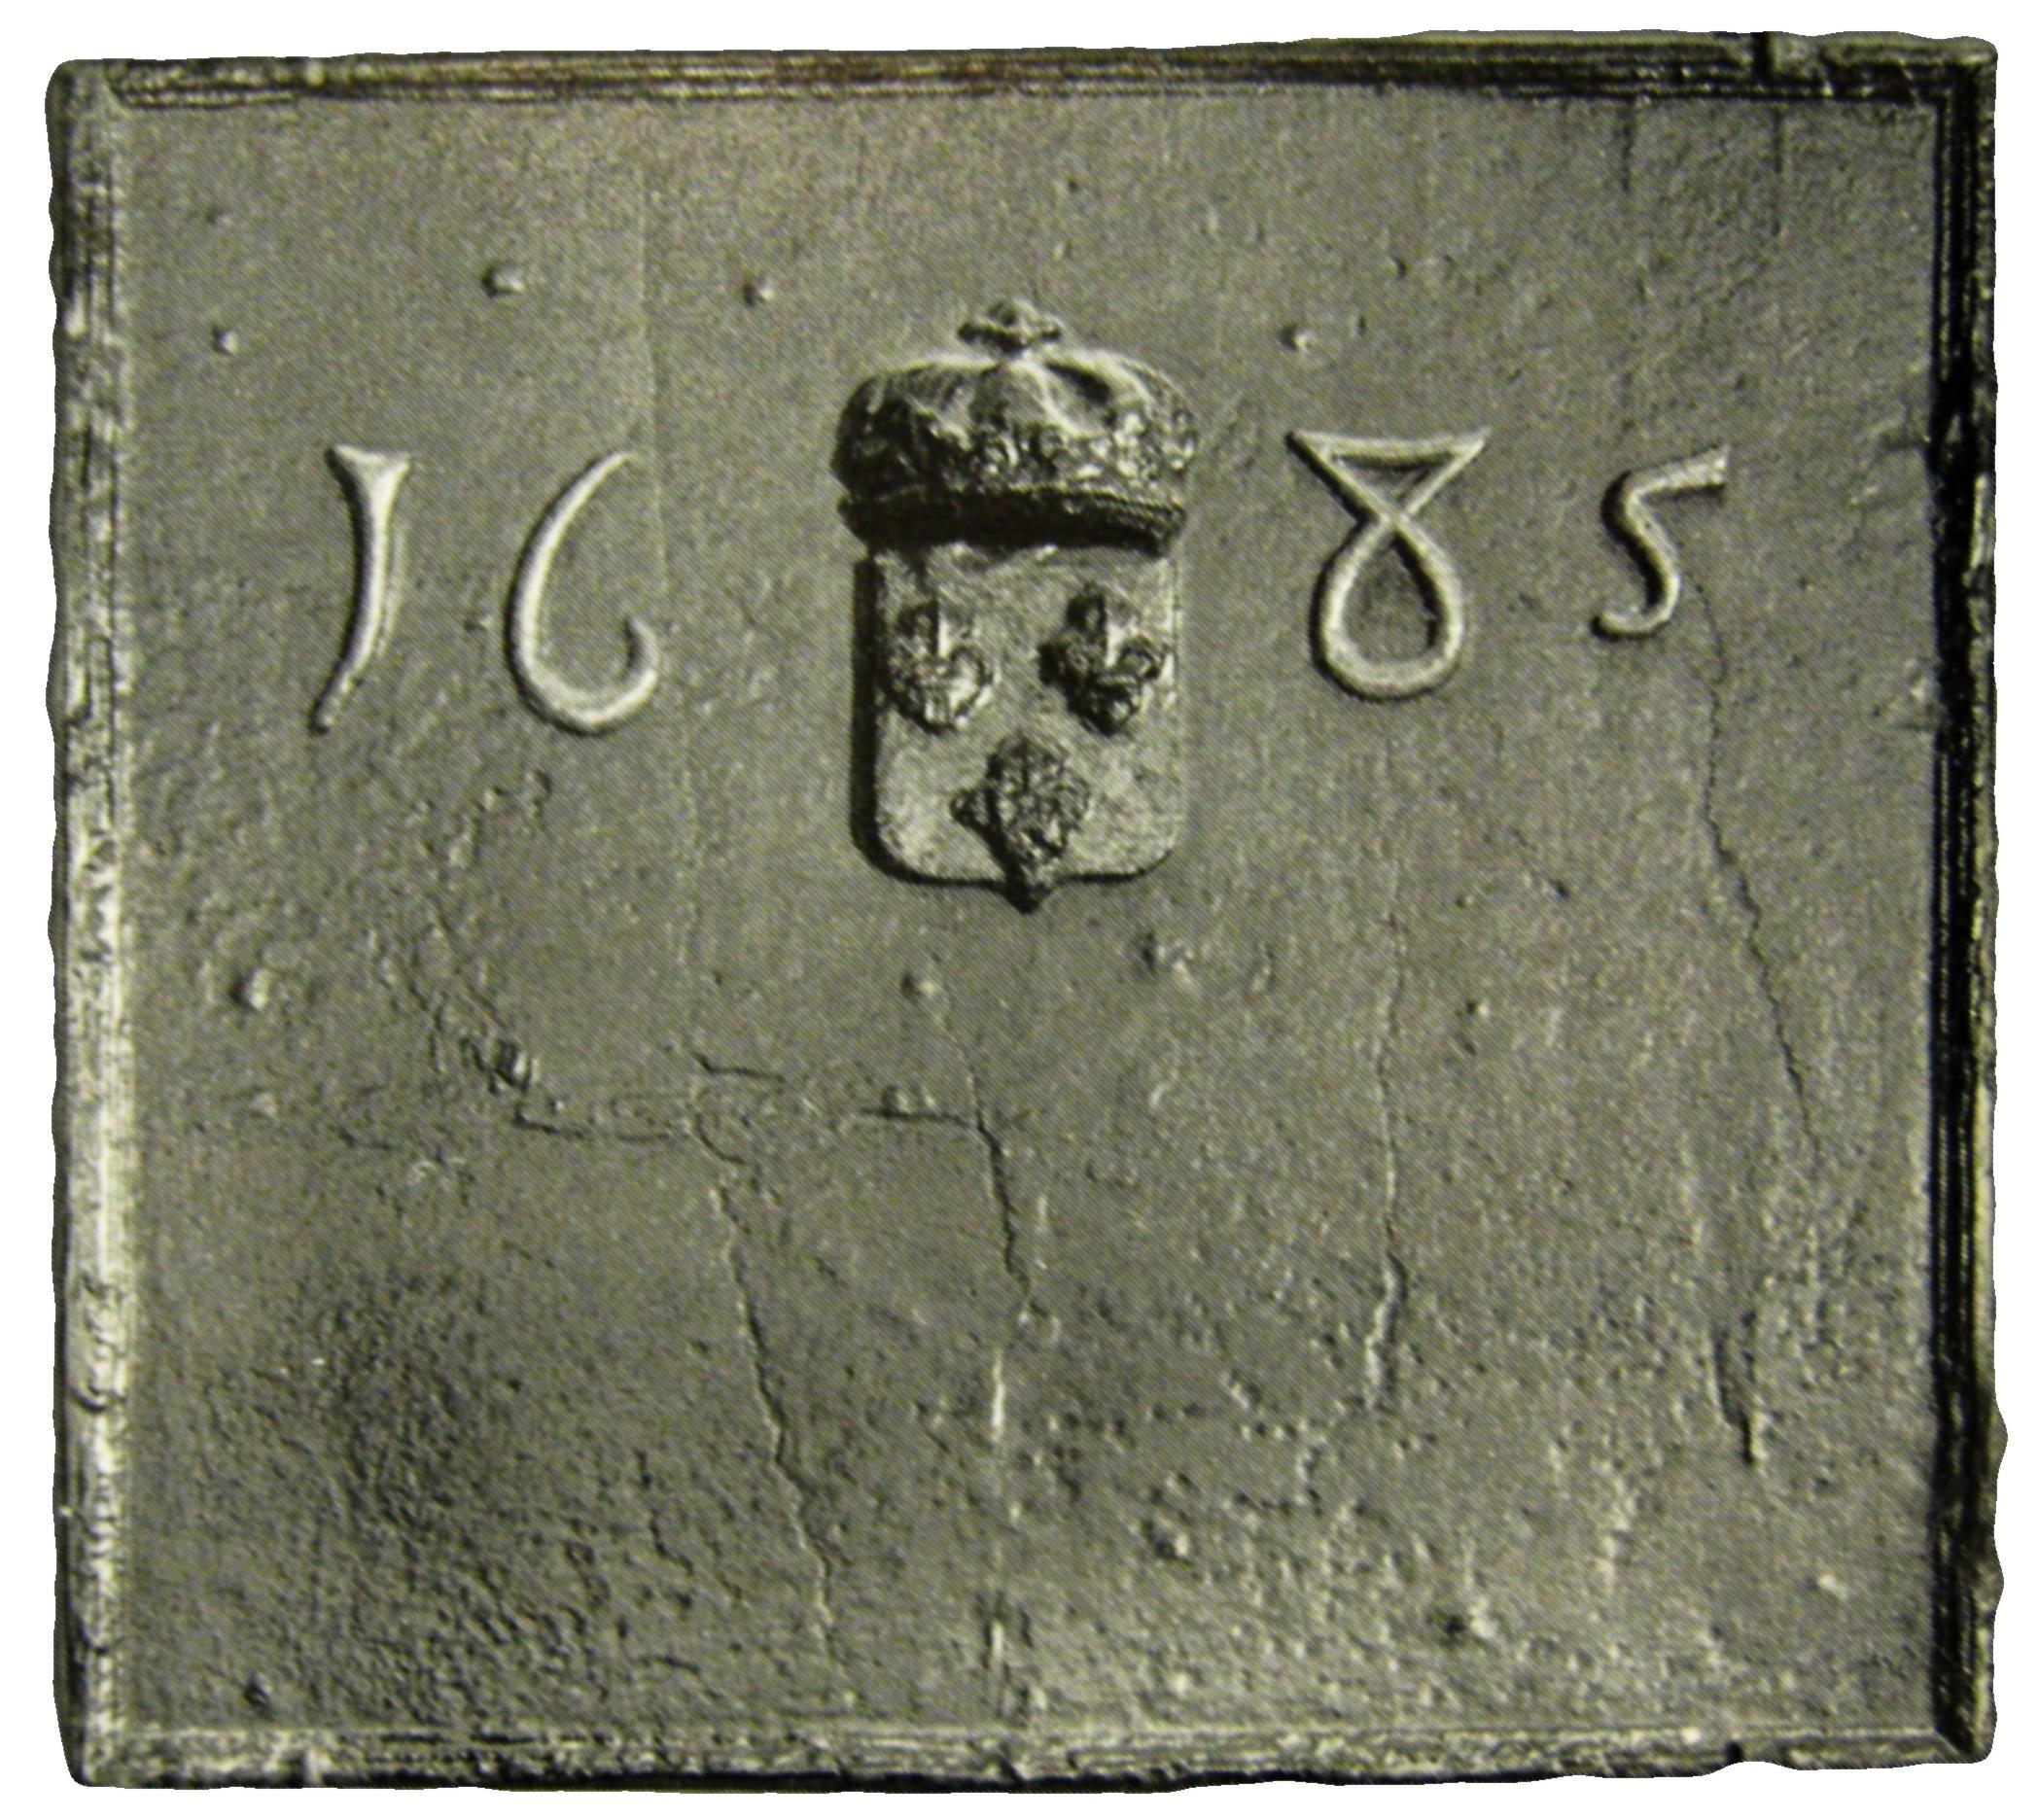 File:DH Takenplatte 1685.jpg